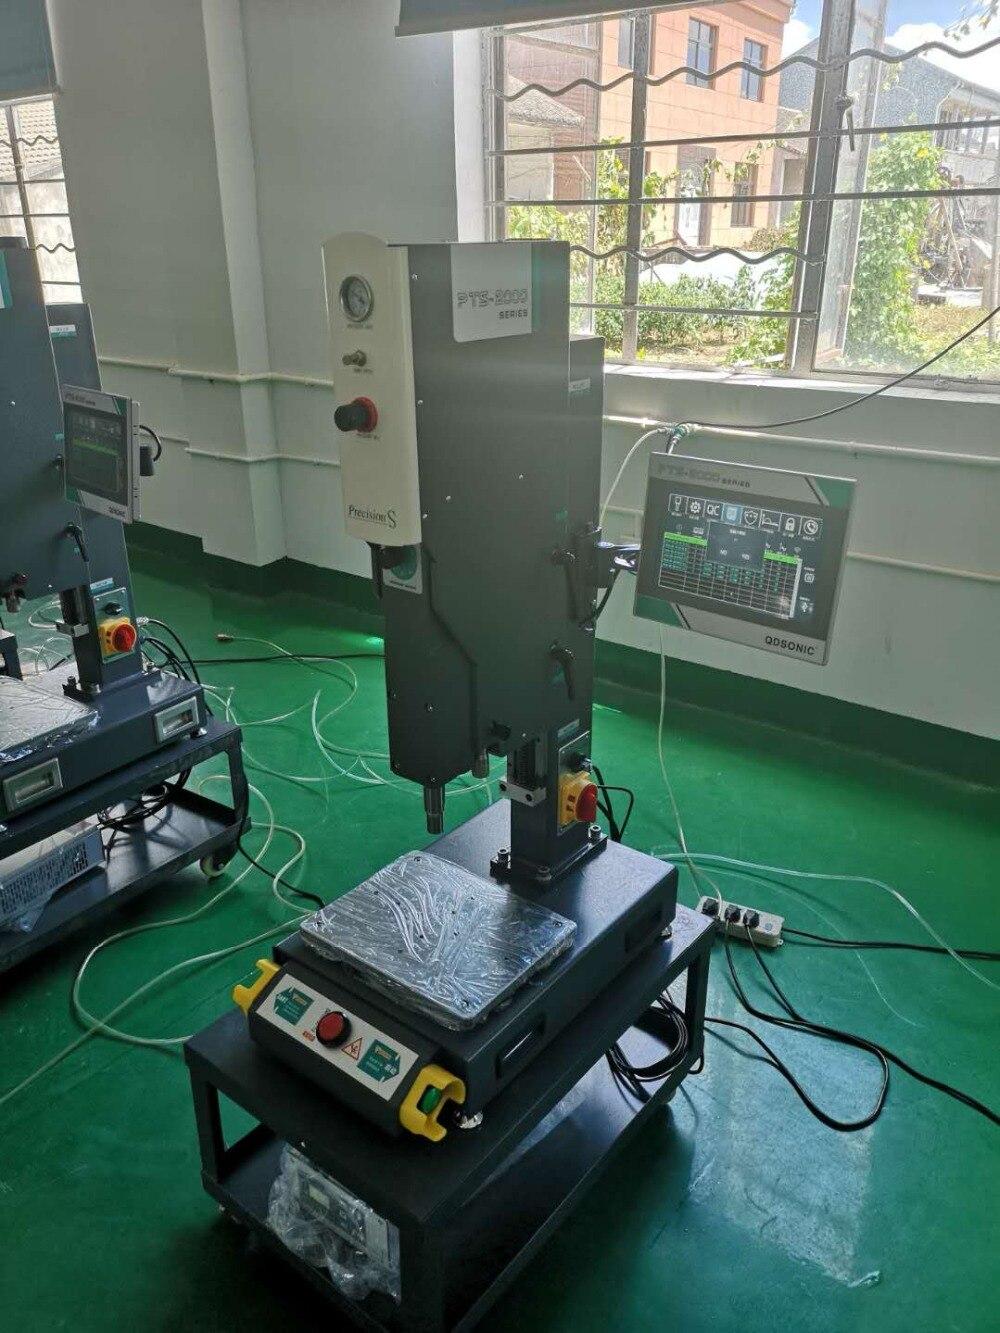 Bonne ultrasonic welding machine for plastic sheets ultrasound plastic welder